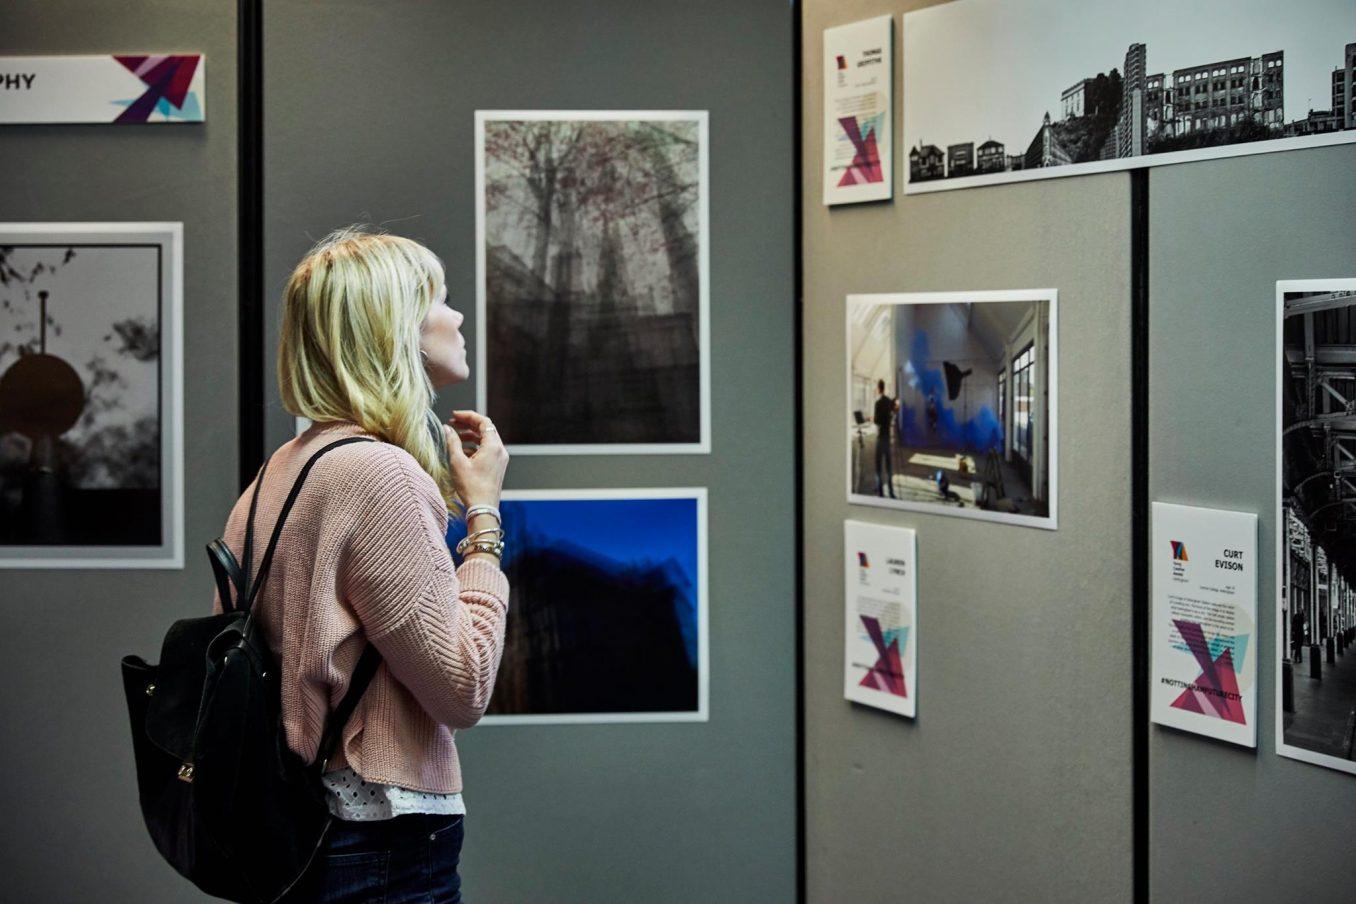 exhibition-1356x904.jpg